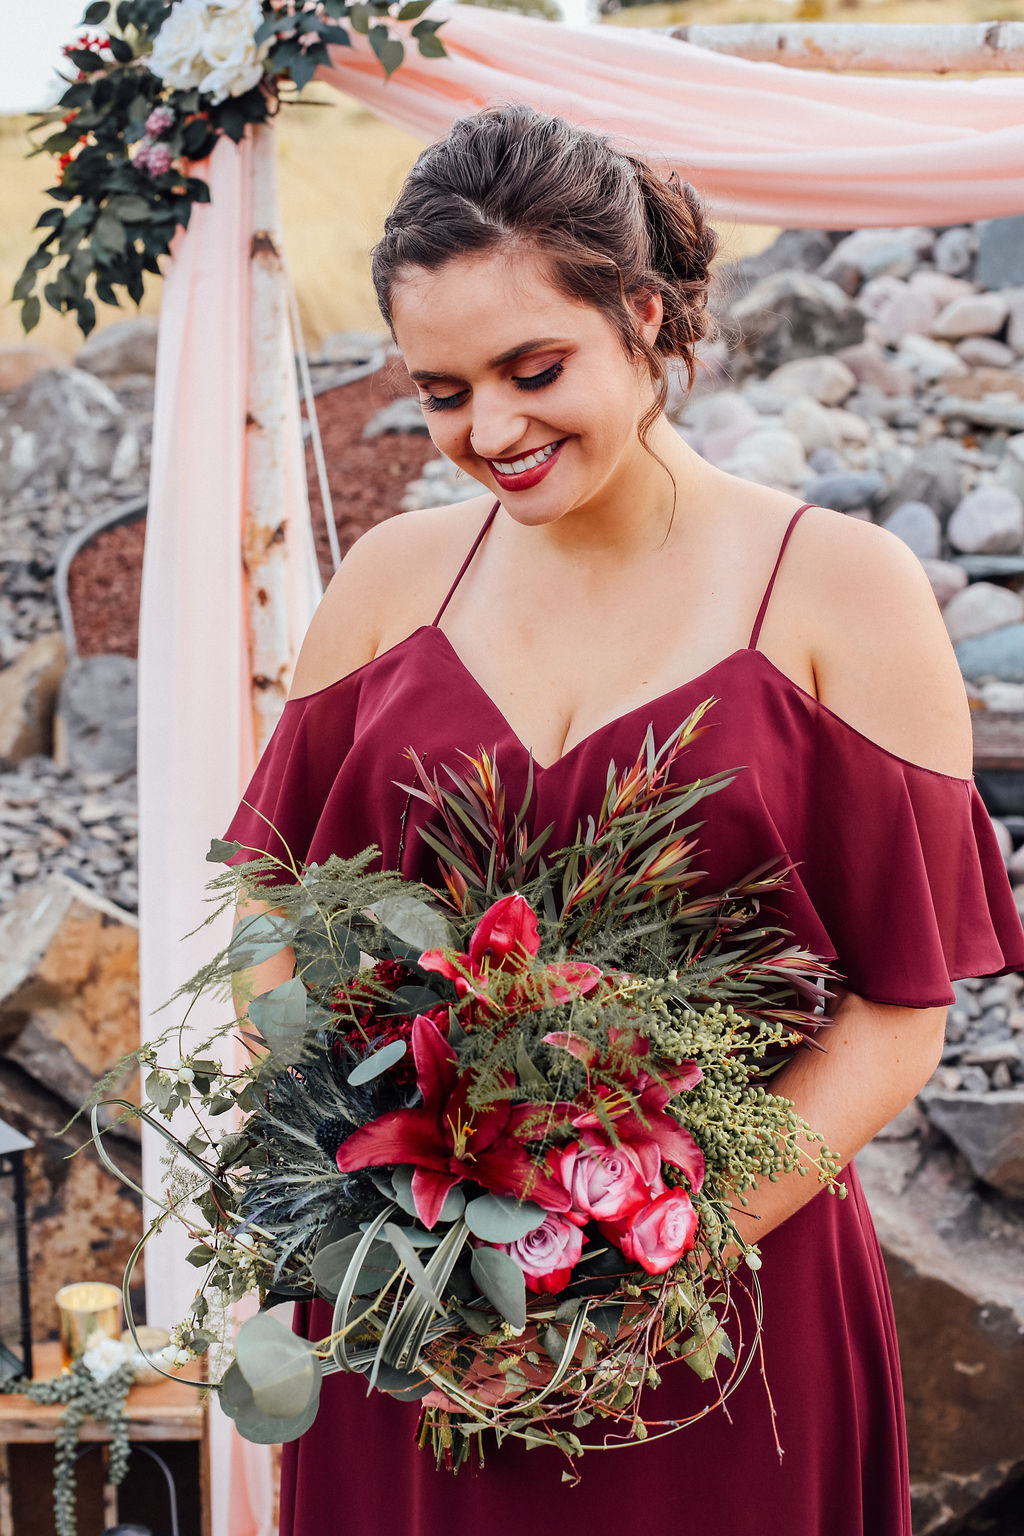 509 Bride_the 509 bride_purple pineapple photography_19